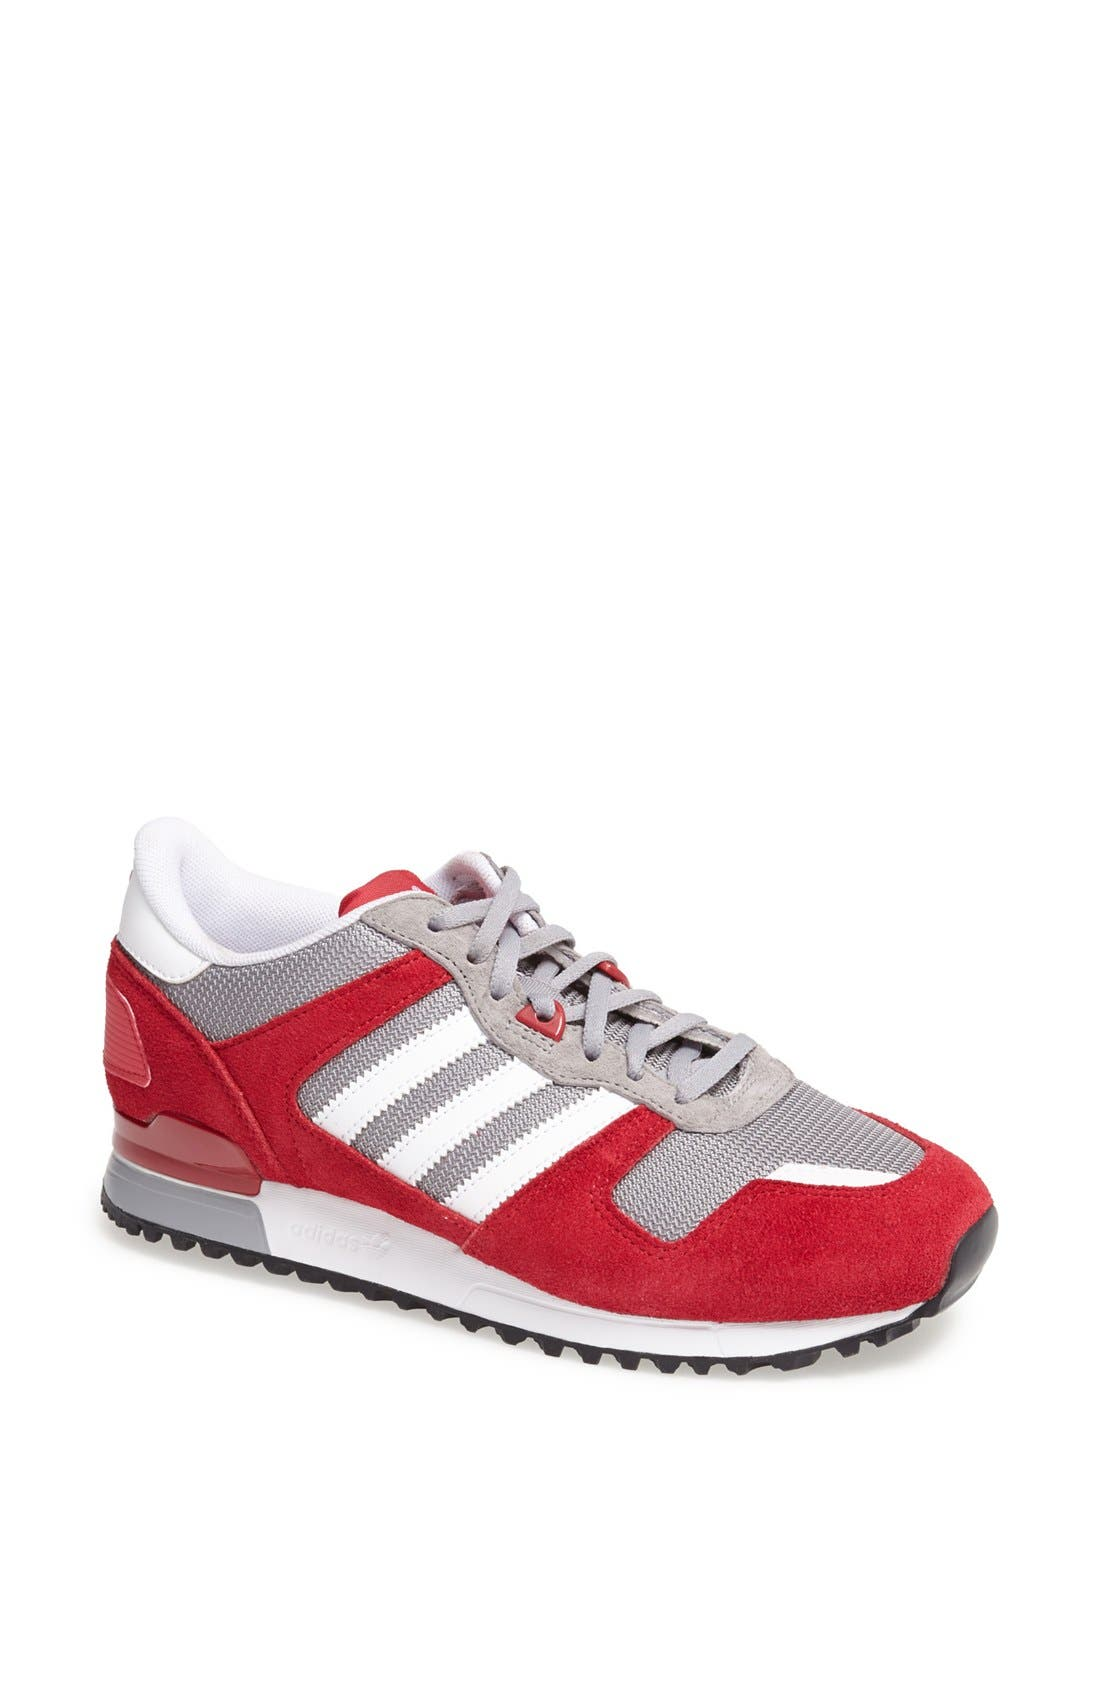 Alternate Image 1 Selected - adidas 'ZXZ 700' Sneaker (Women)